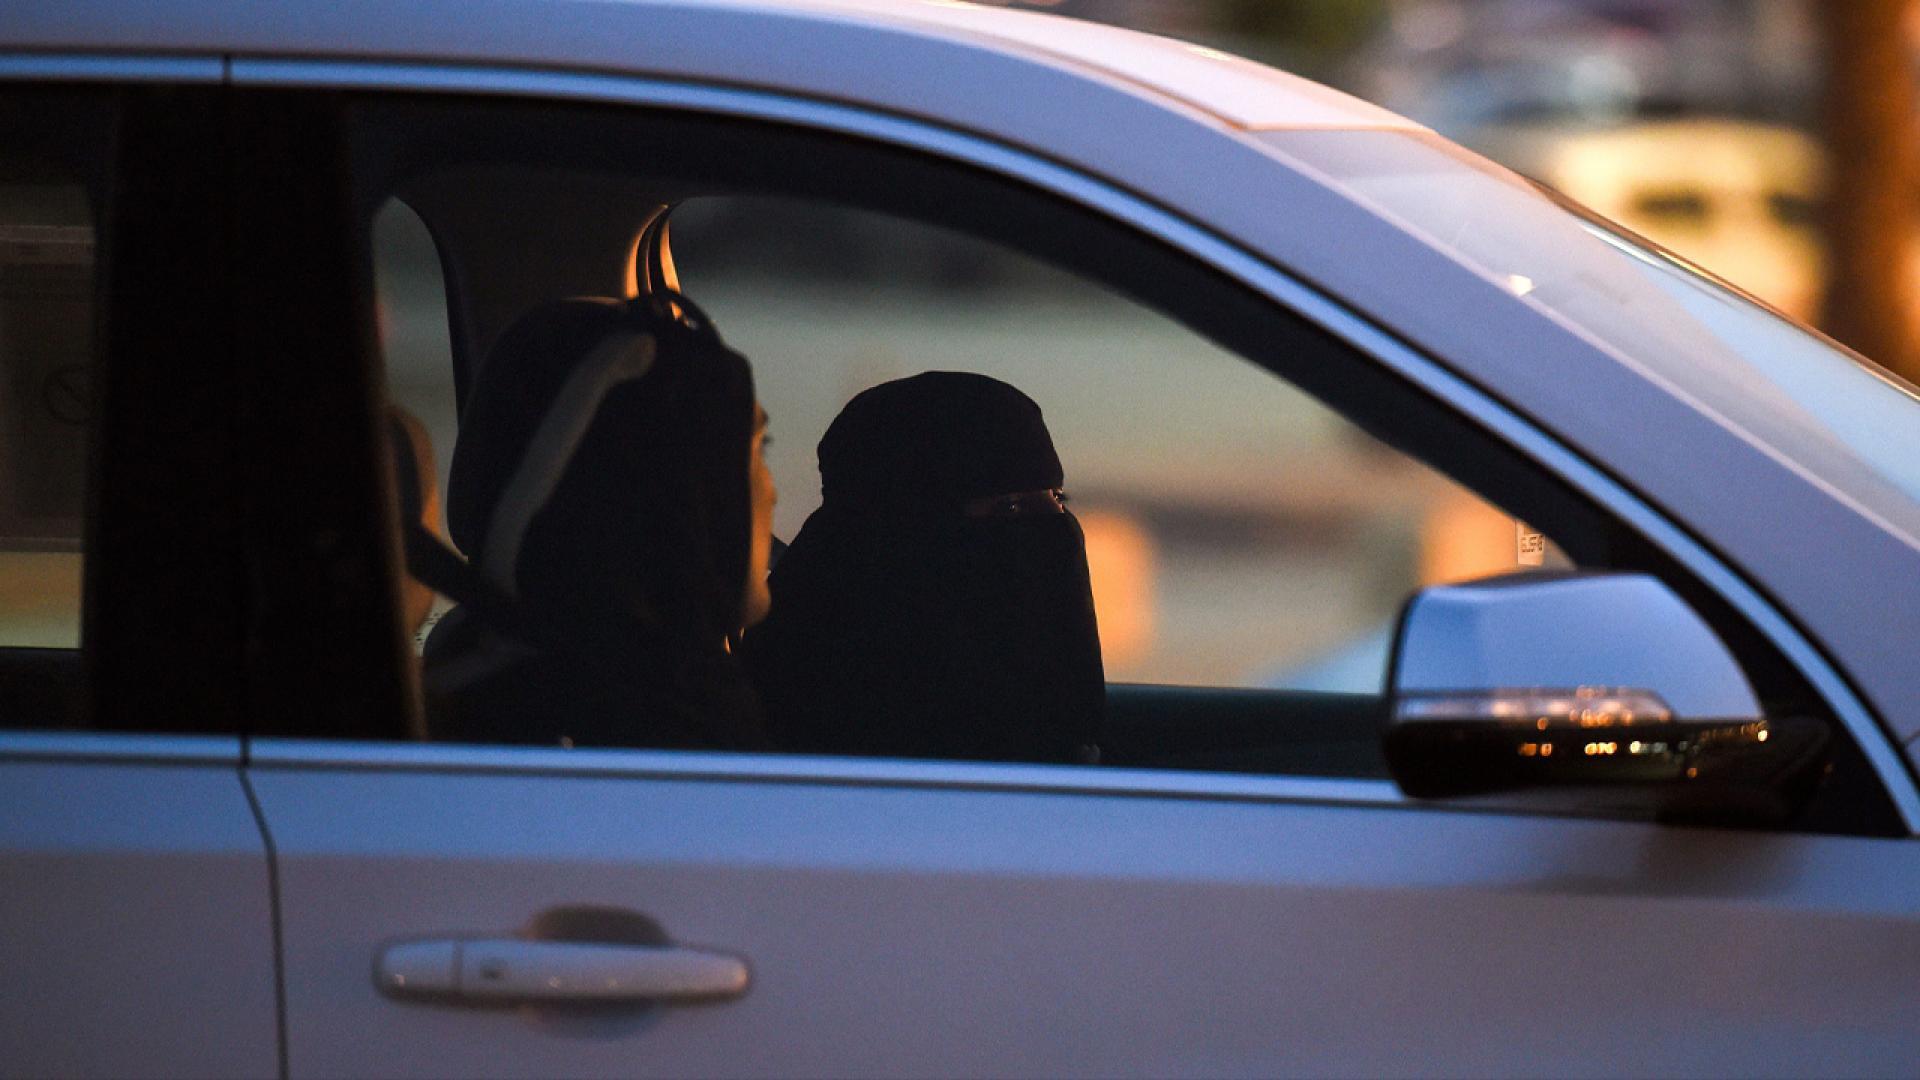 Two Saudi women driving. Loujain al-Hathloul not pictured.